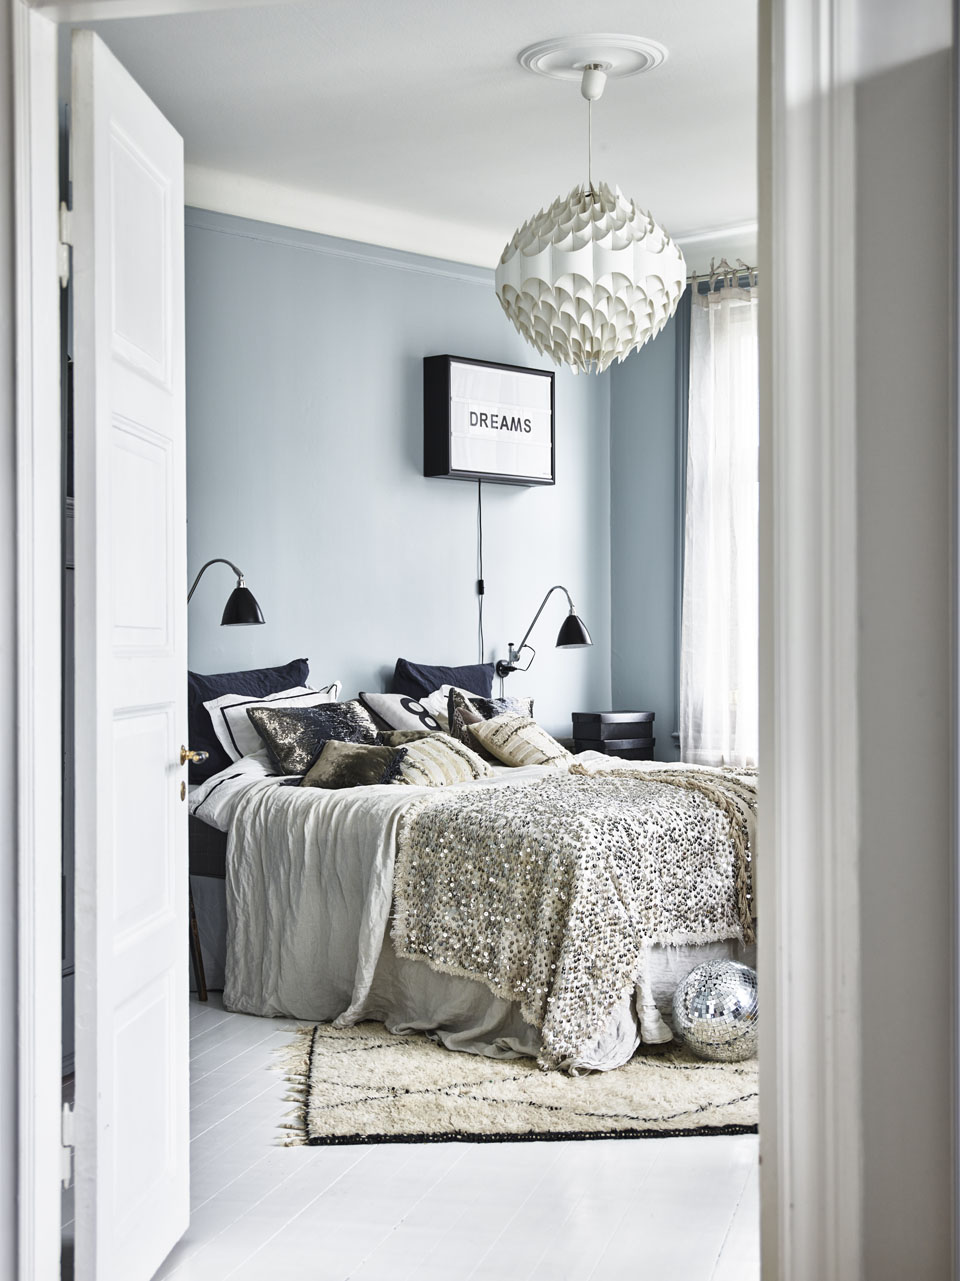 leuke slaapkamer ideeen slaapkamer idee235n